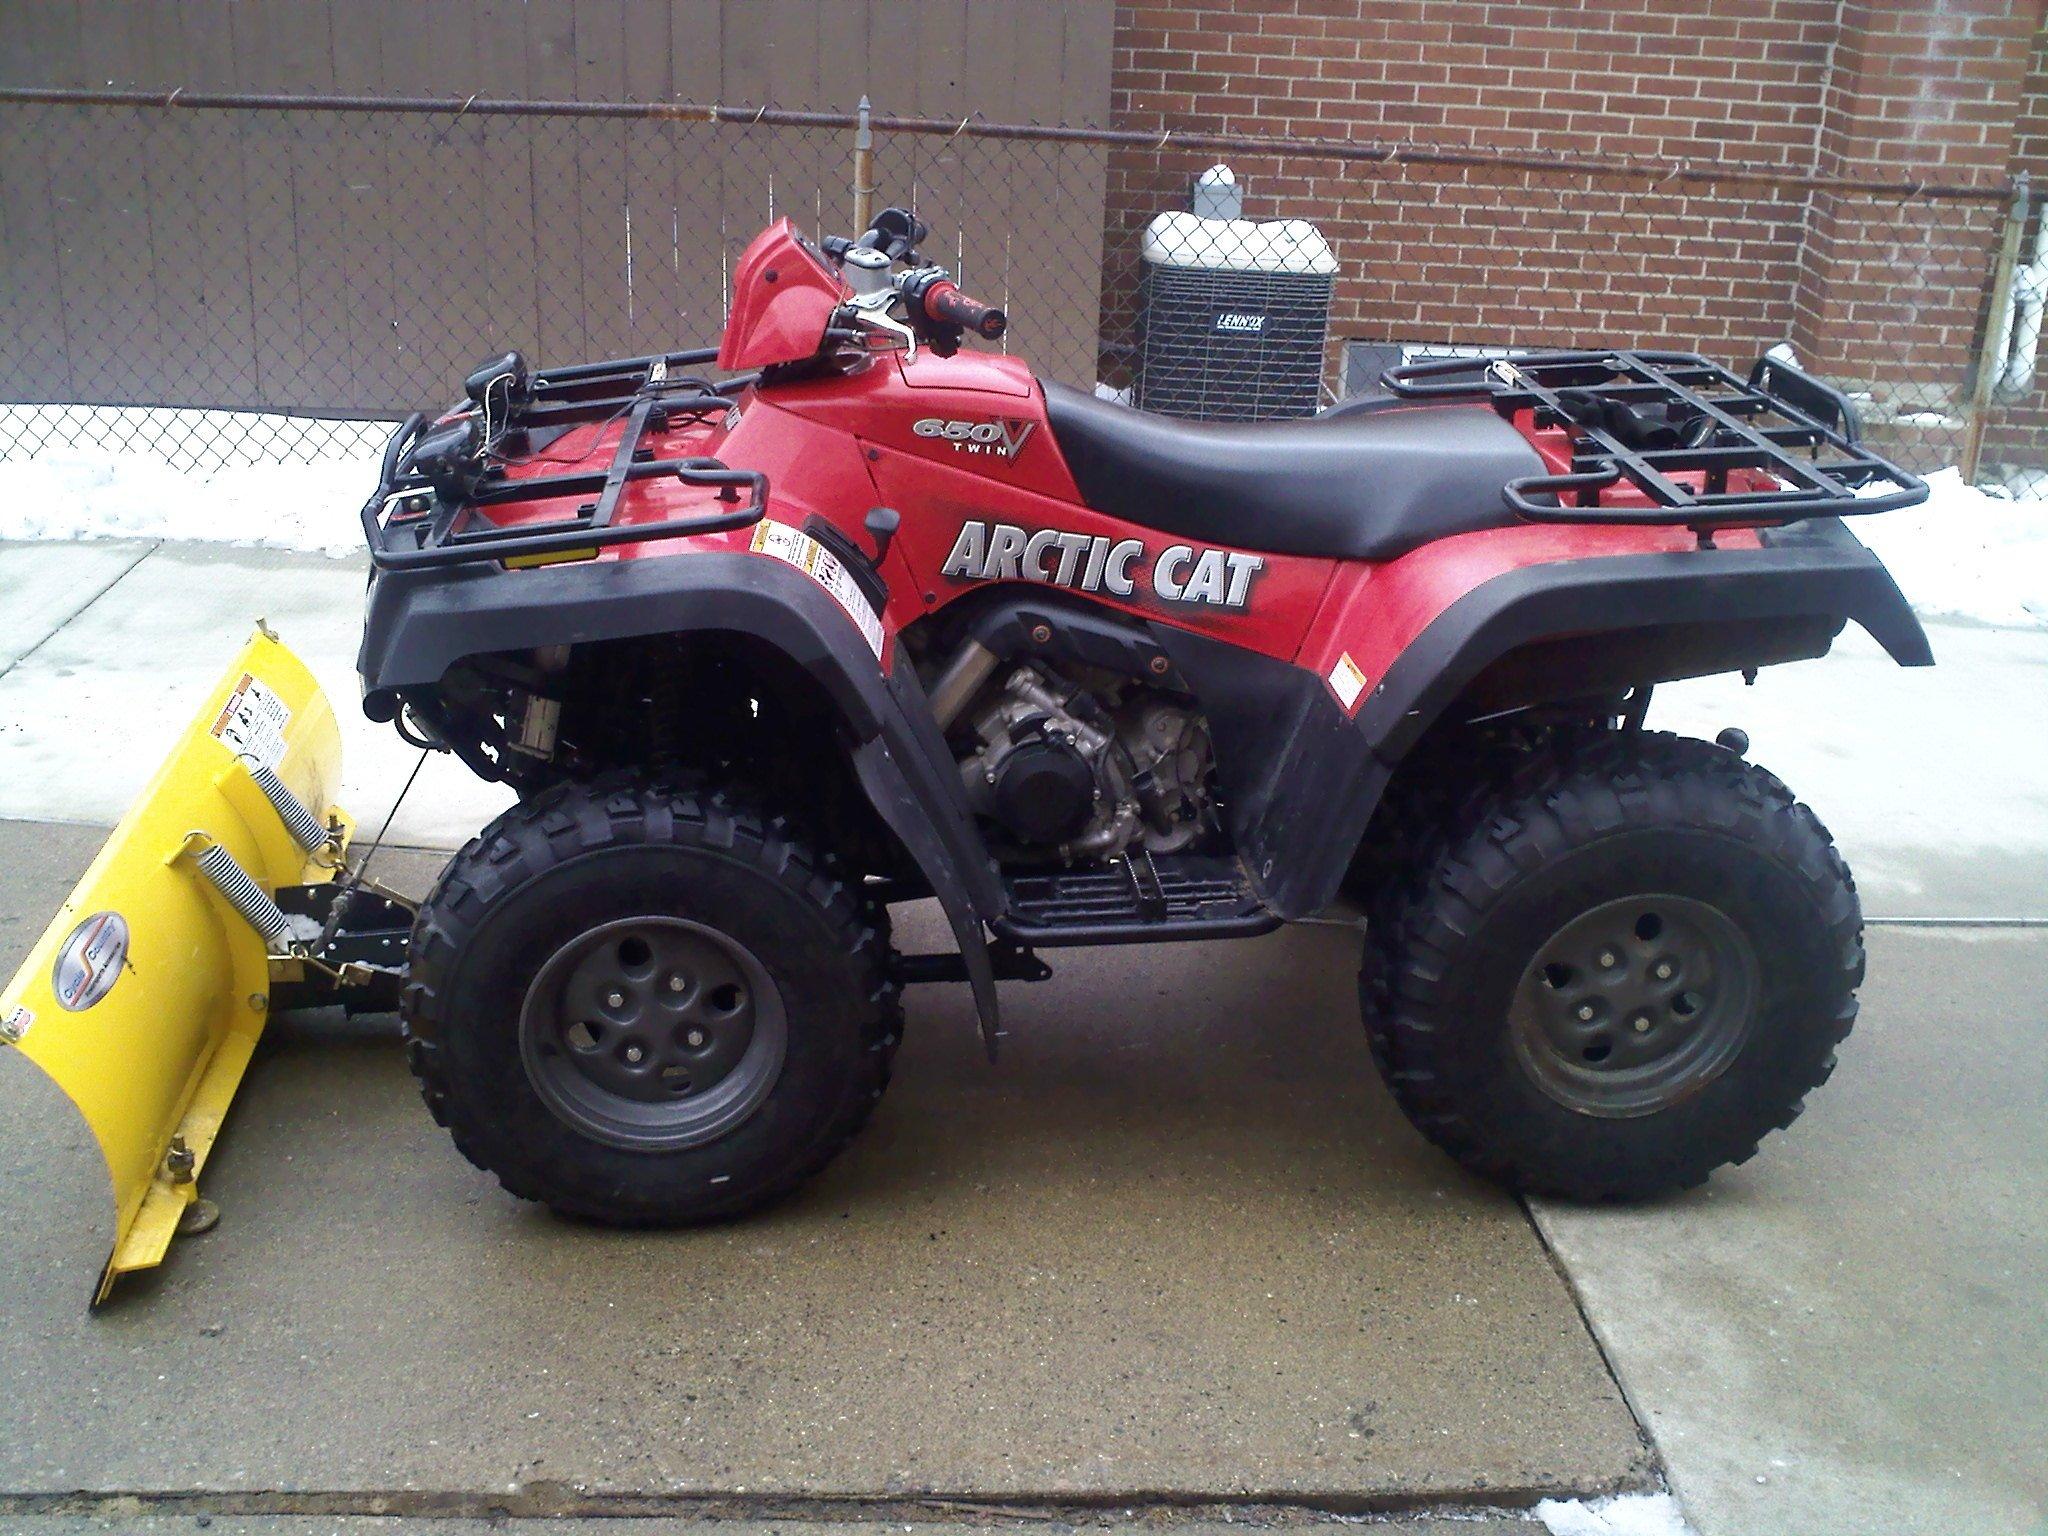 Arctic Cat 4 Wheeler >> how much is a 2004 650 v2 worth - ArcticChat.com - Arctic Cat Forum